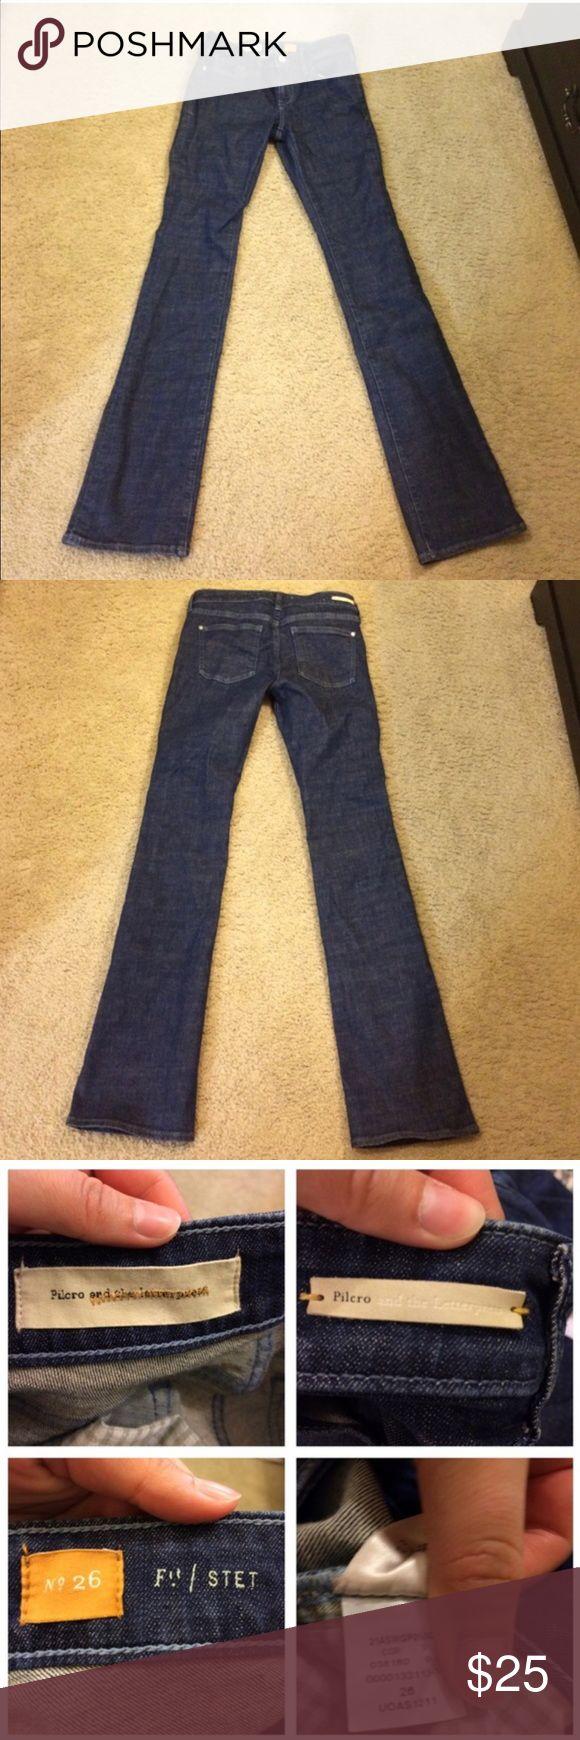 "Anthropologie Pilcro dark denim Jeans 👖 26 Anthropologie Pilcro and the letterpress brand. Good quality dark wash jeans in great condition. 33"" inseam. Anthropologie Jeans"